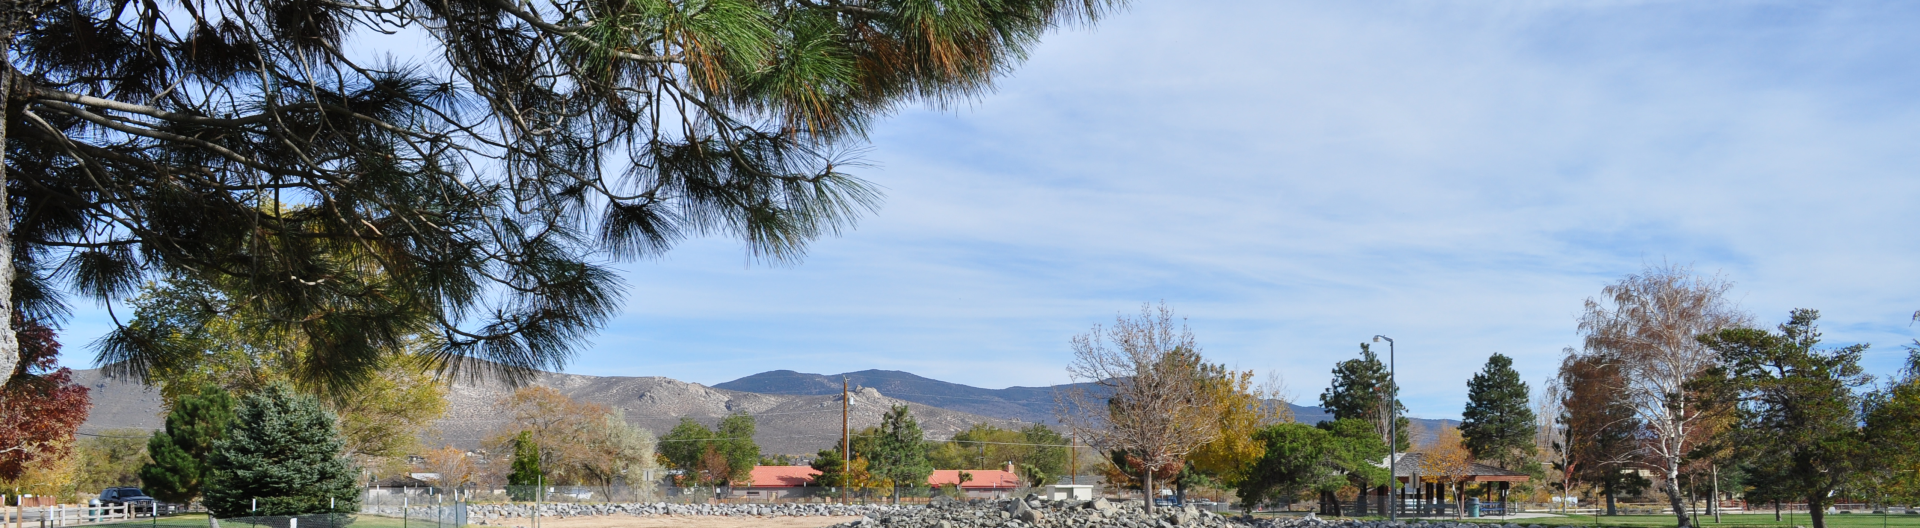 Ross Gold Park Carson City